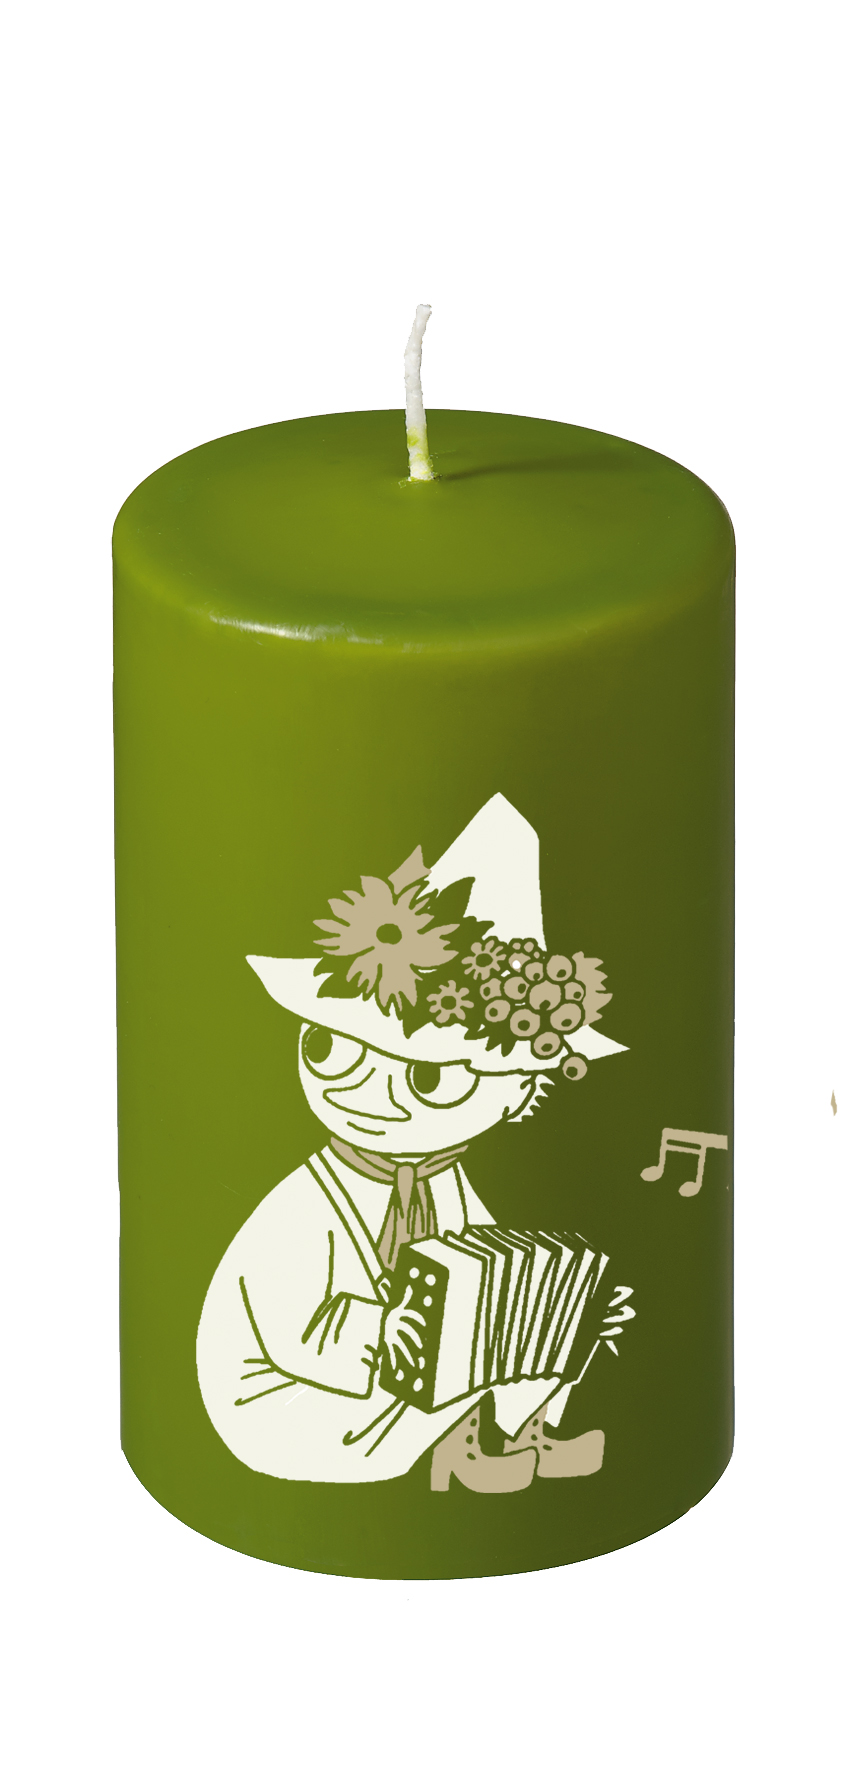 Suomen Kerta Oy Snufkin Pillar Candle